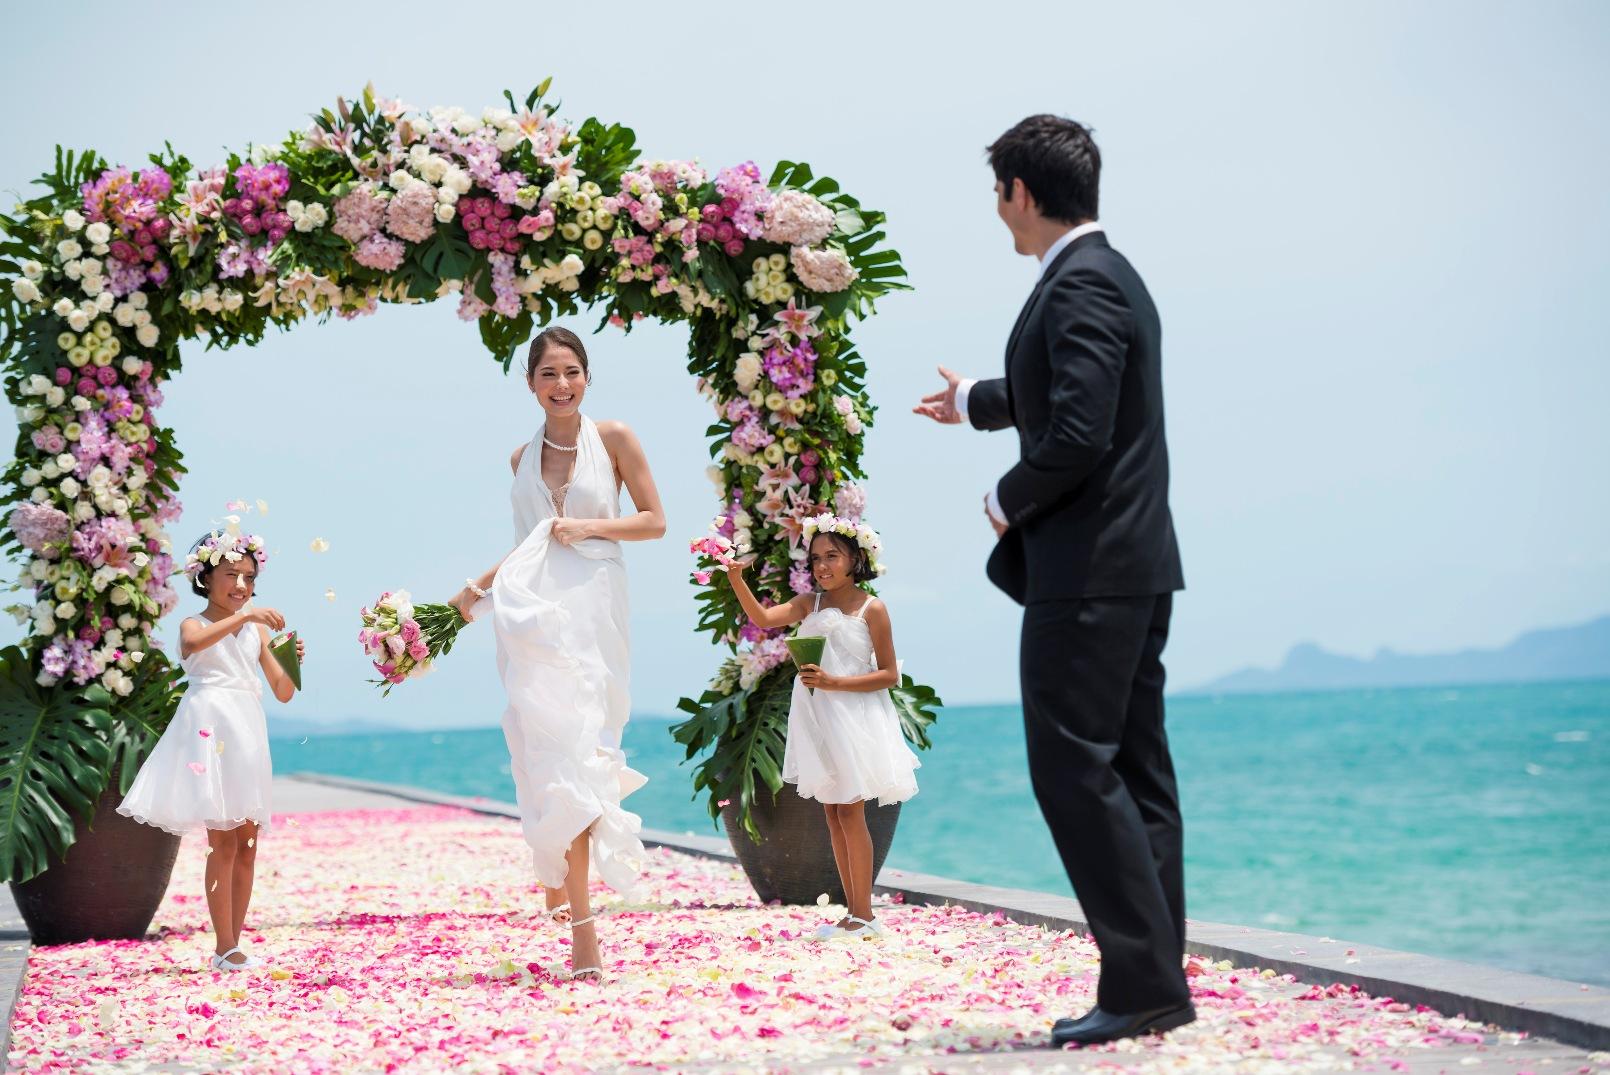 Bride and groom wedding ceremony in Thailand